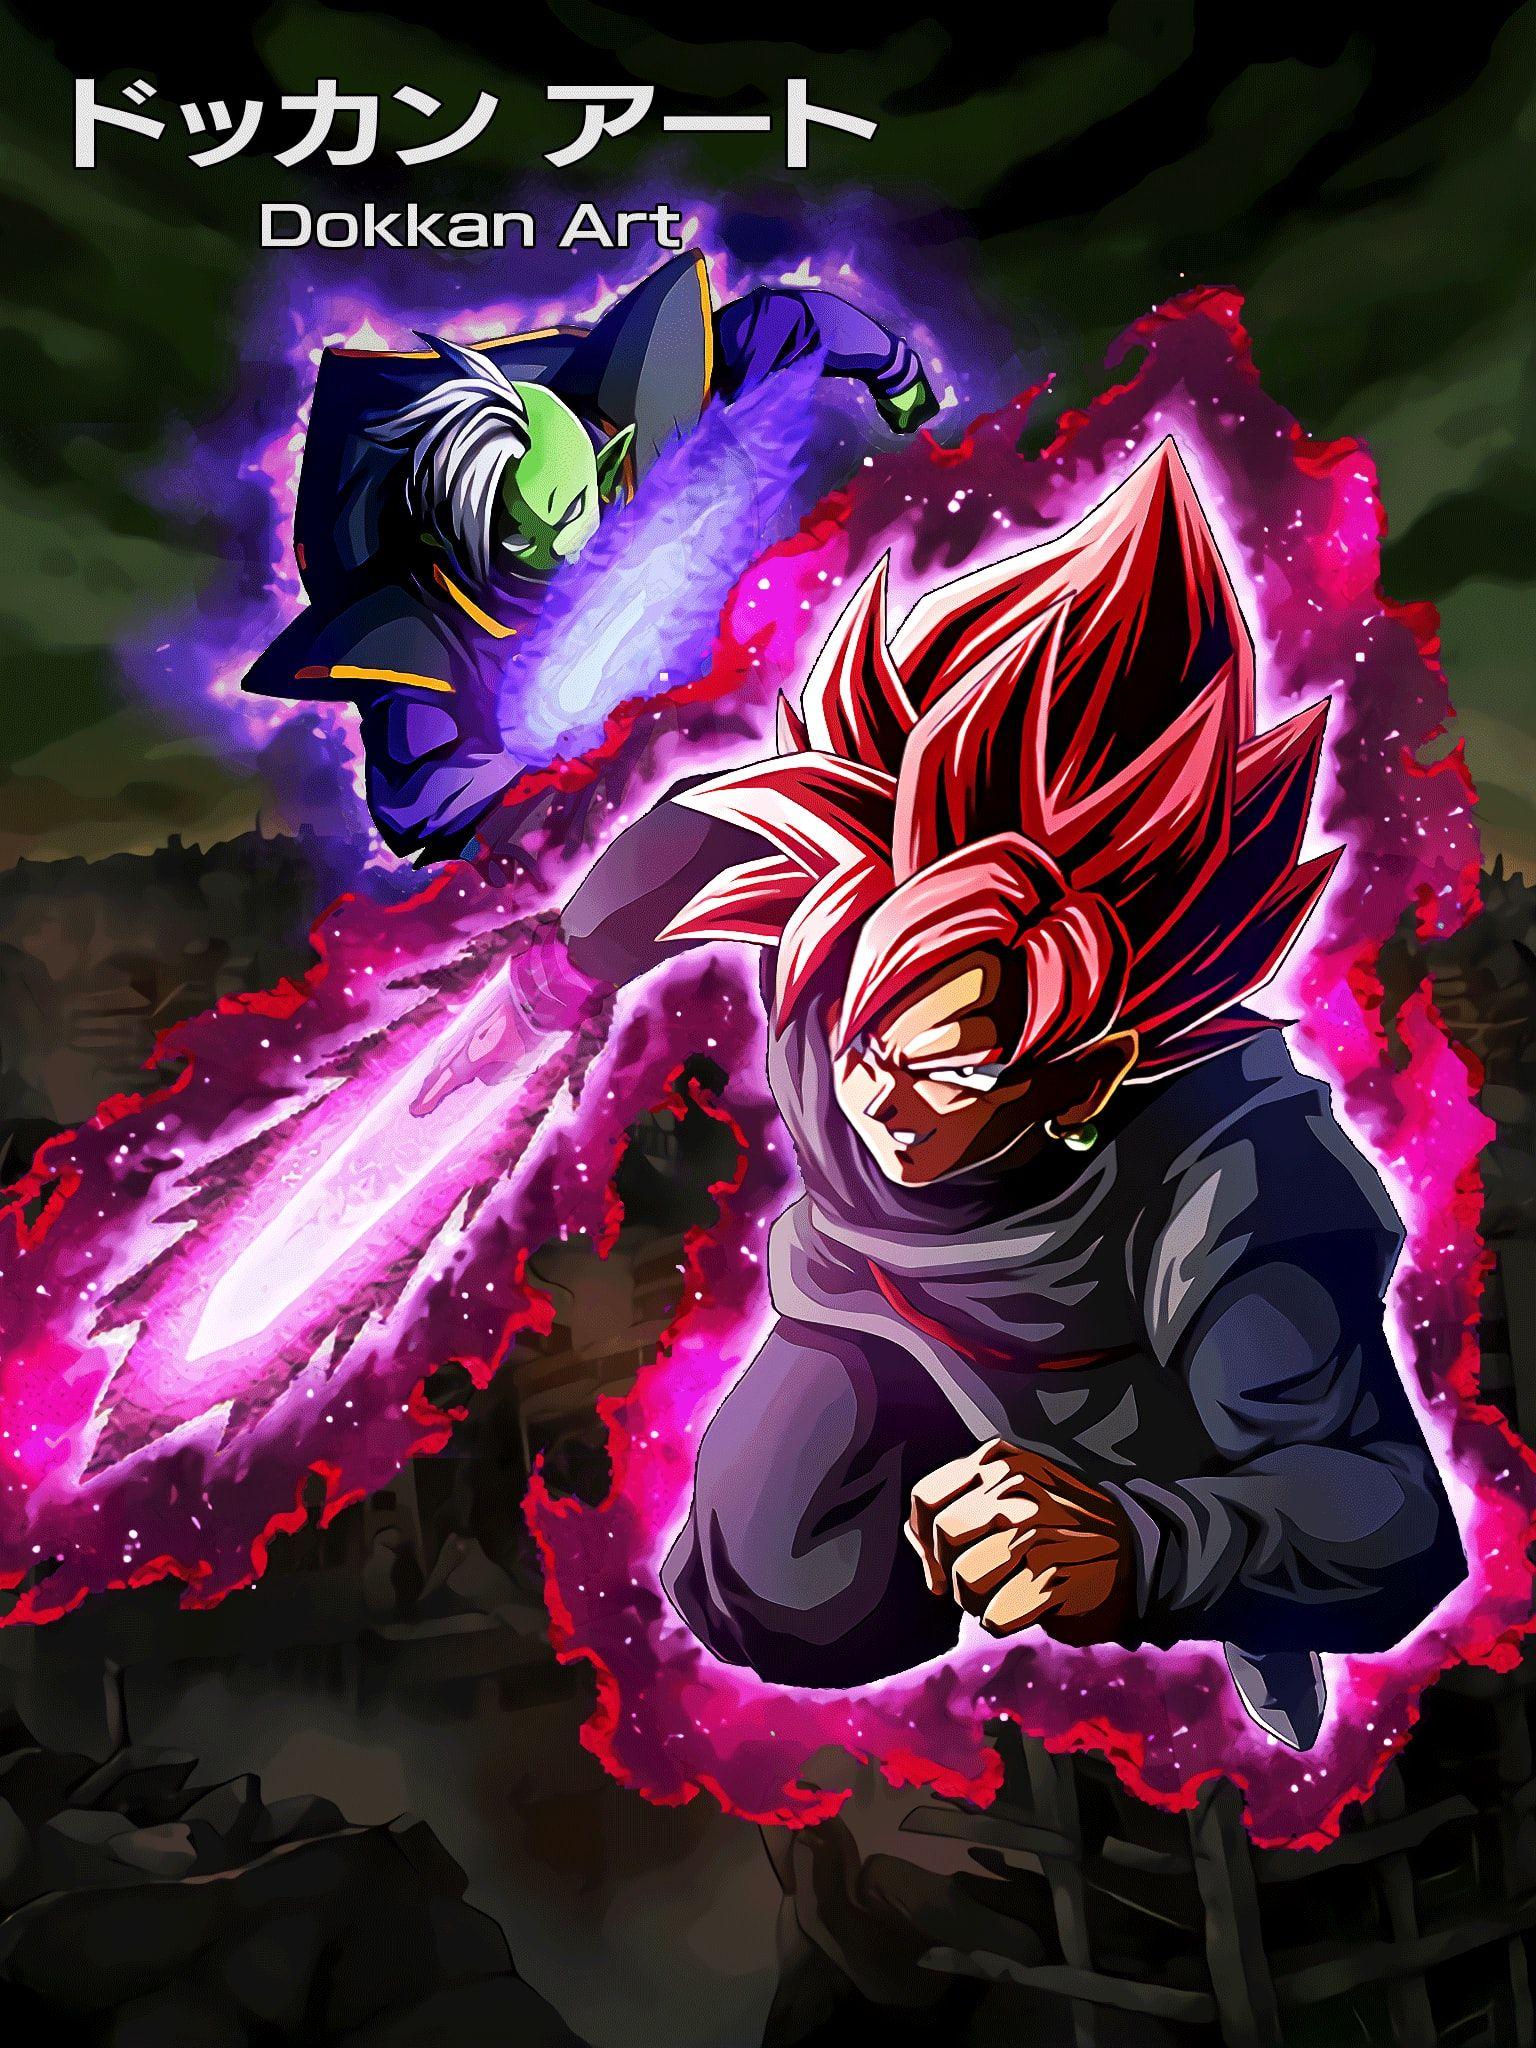 Lr Goku Black Rose Zamasu Hd Animation Dokkanart Dragon Ball Anime Dragon Ball Dragon Ball Super